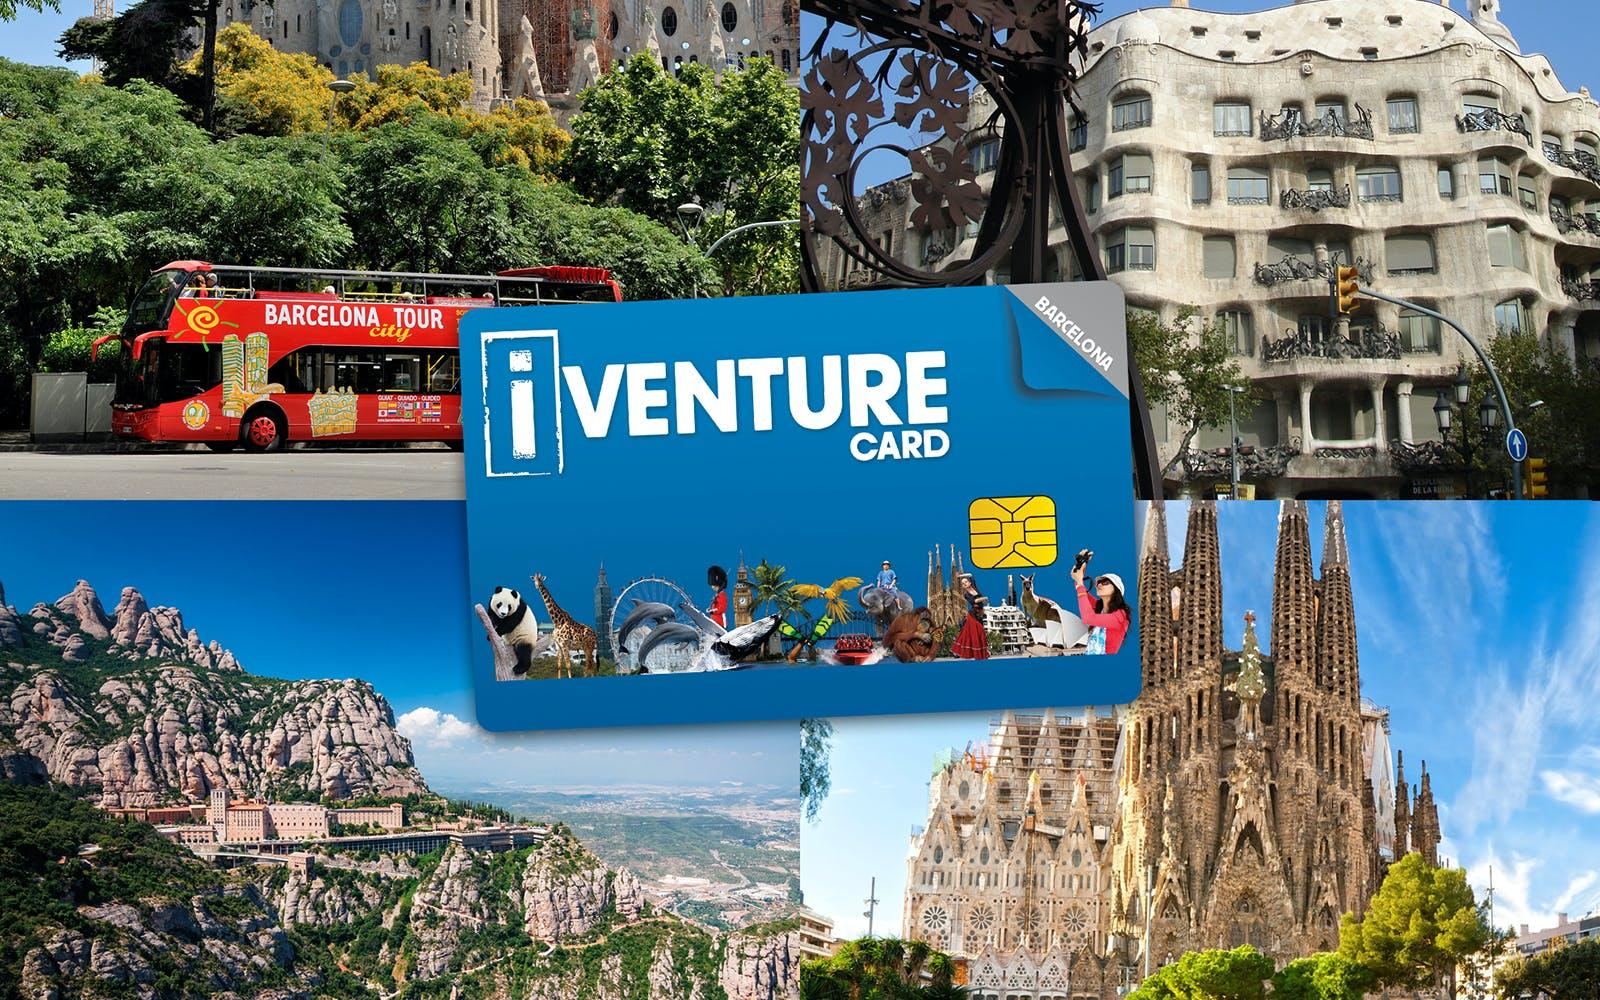 iVenture Card Barcelona